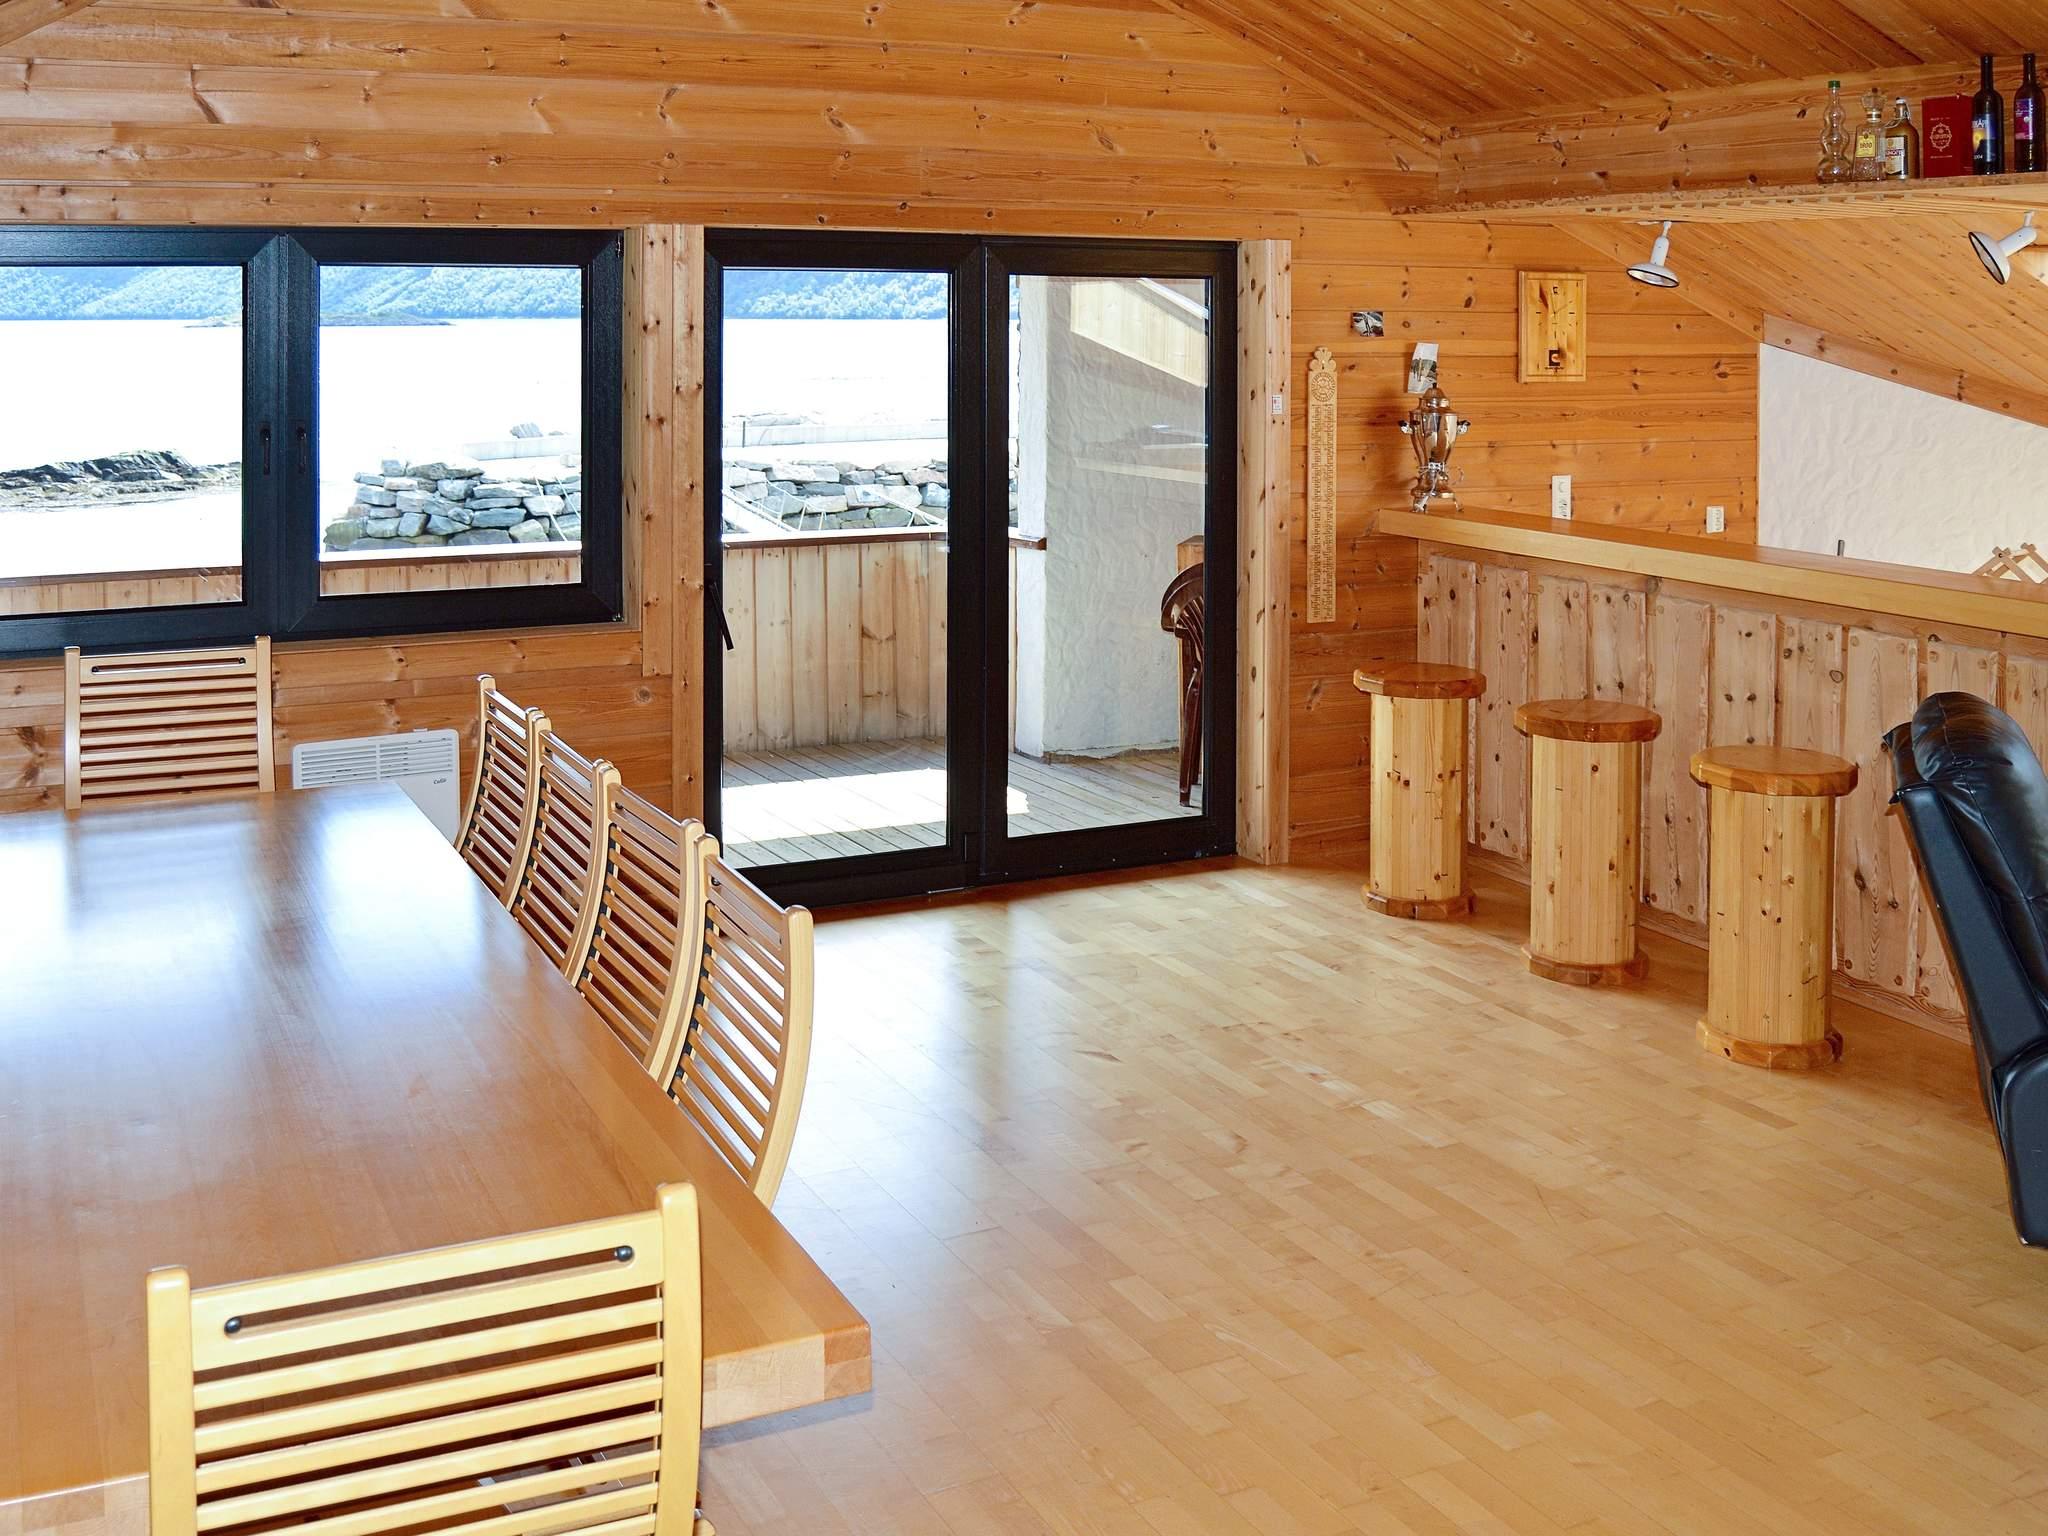 Ferienhaus Eidsvåg (84695), Eidsvåg, More - Romsdal, Westnorwegen, Norwegen, Bild 4